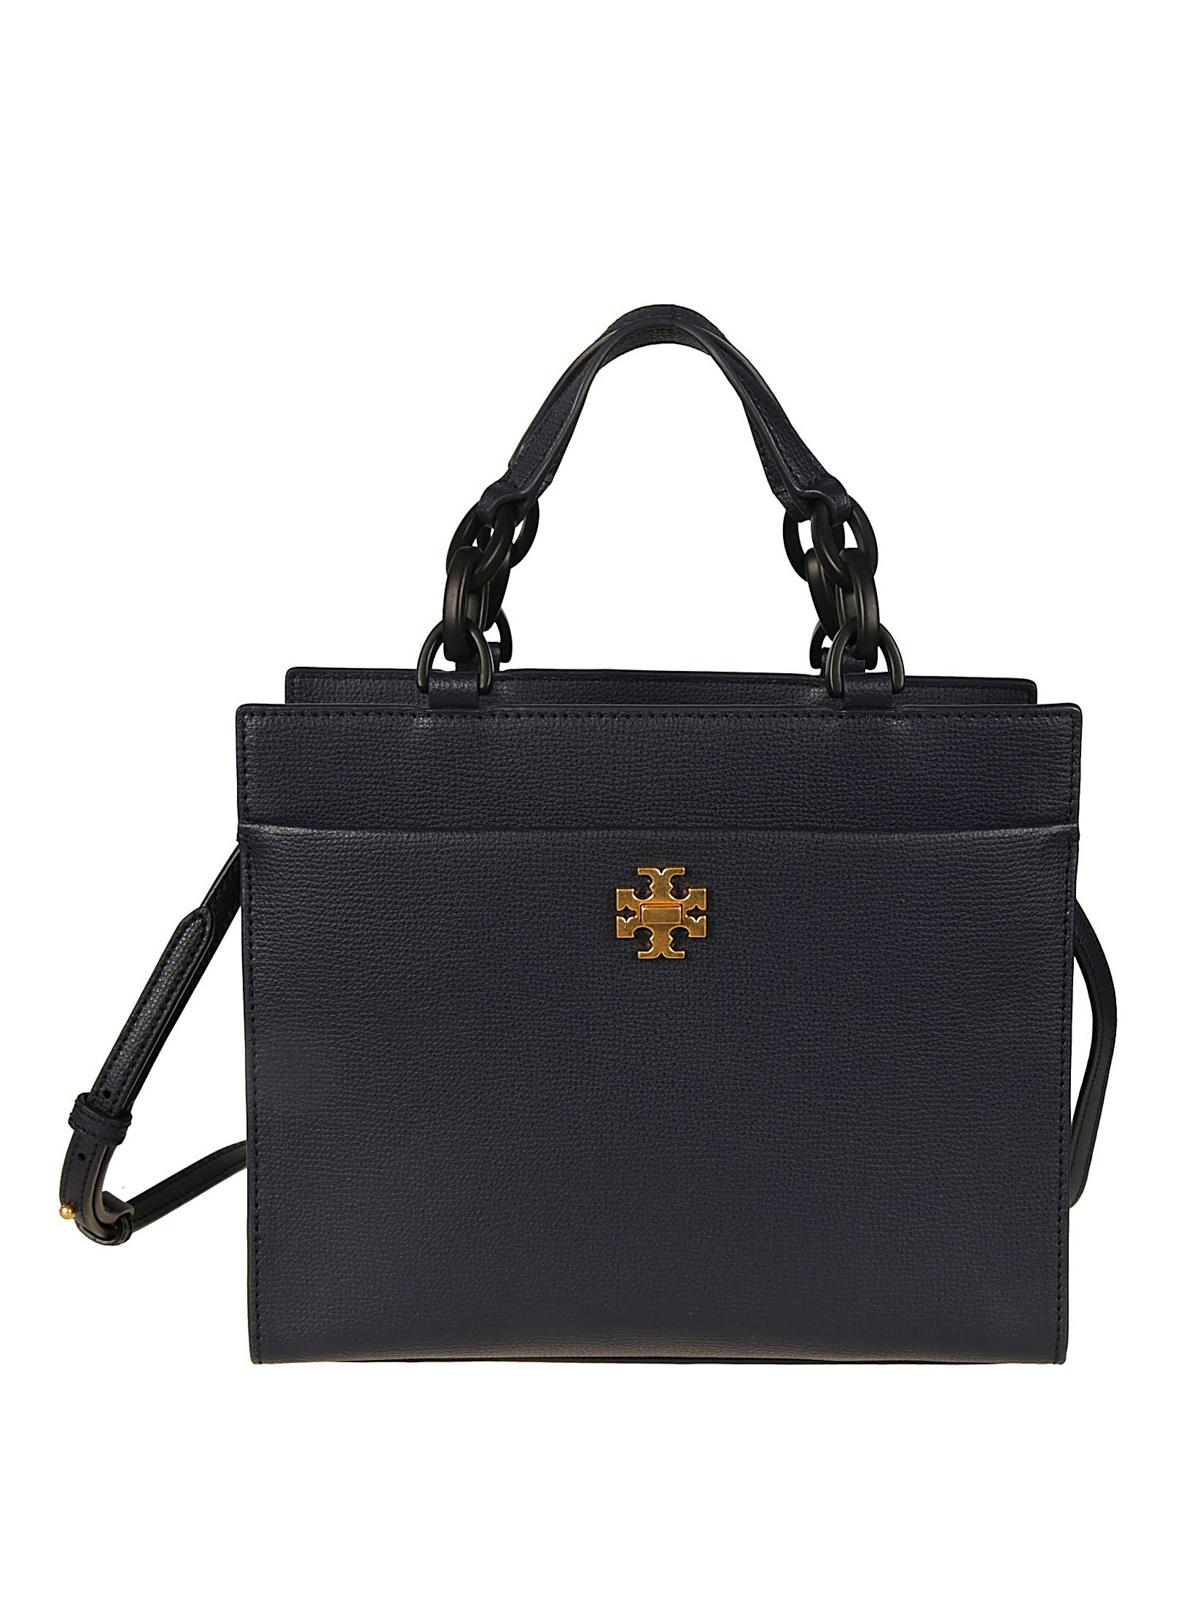 Tory Burch Kira royal navy leather small tote Bd1PAJ